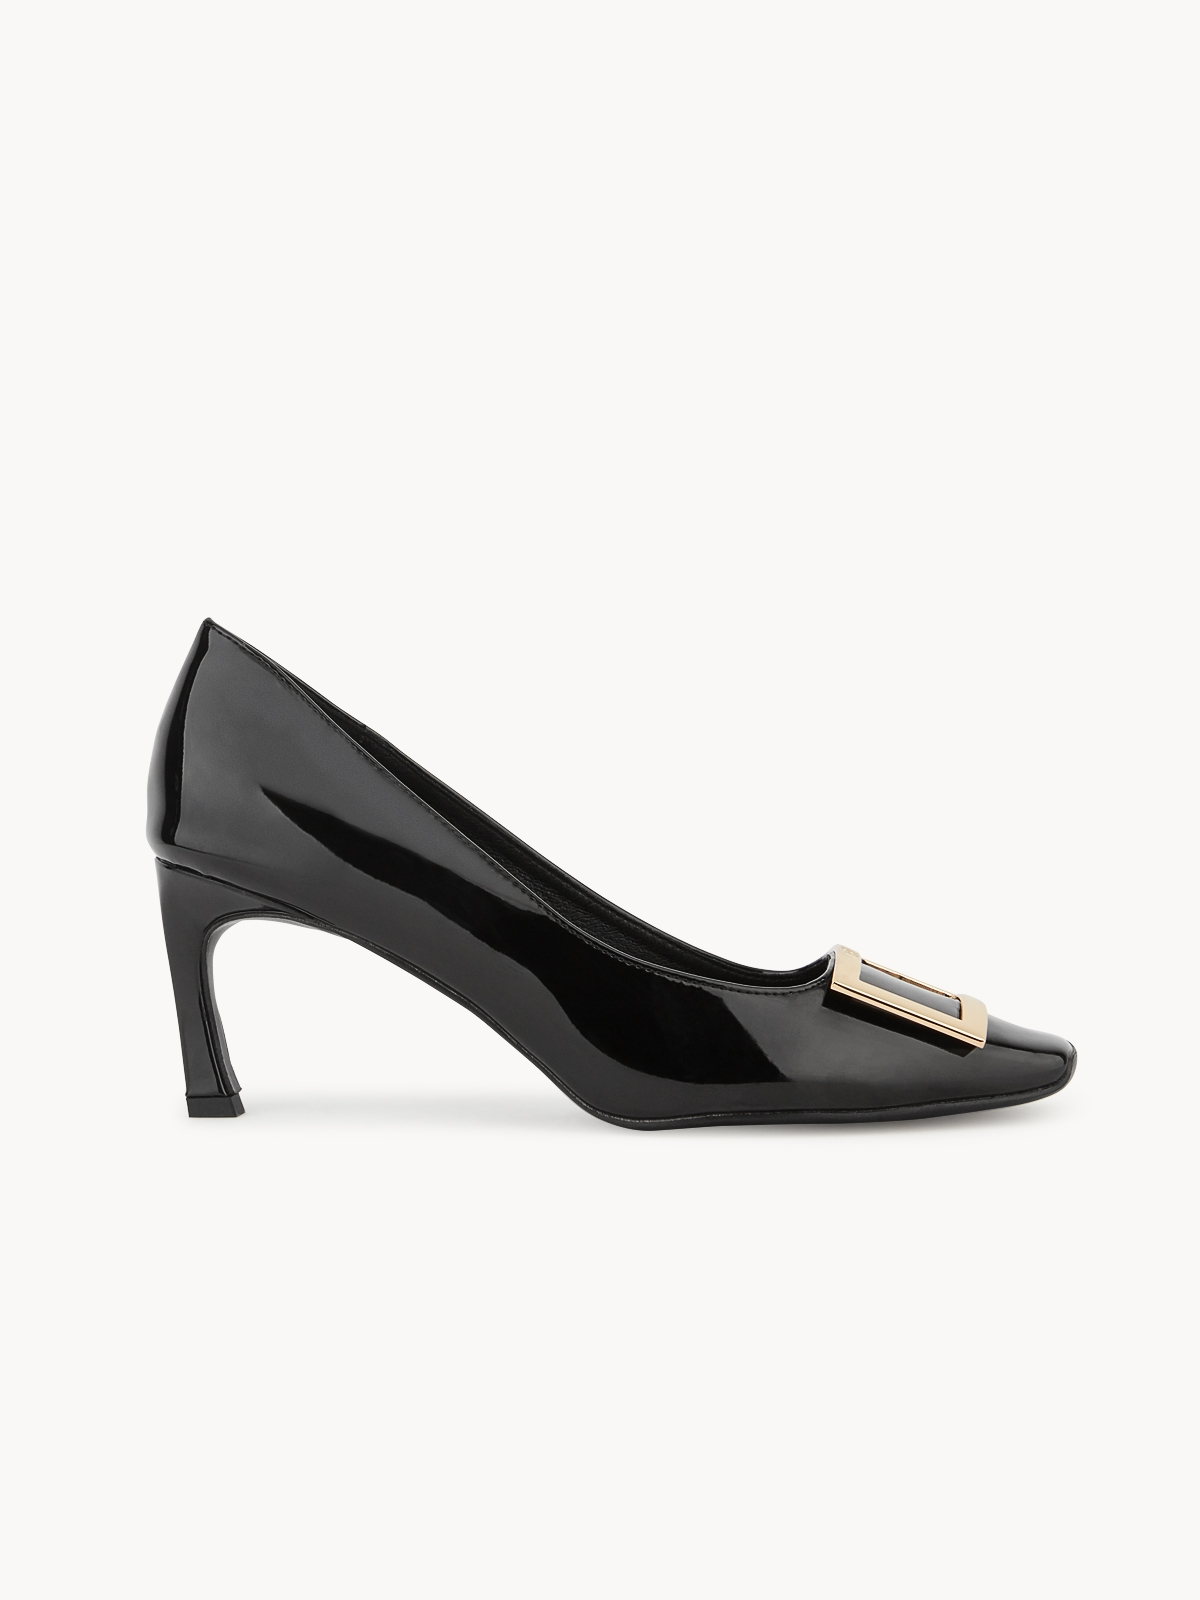 LookAtWe Stella Square Toe Heels Black